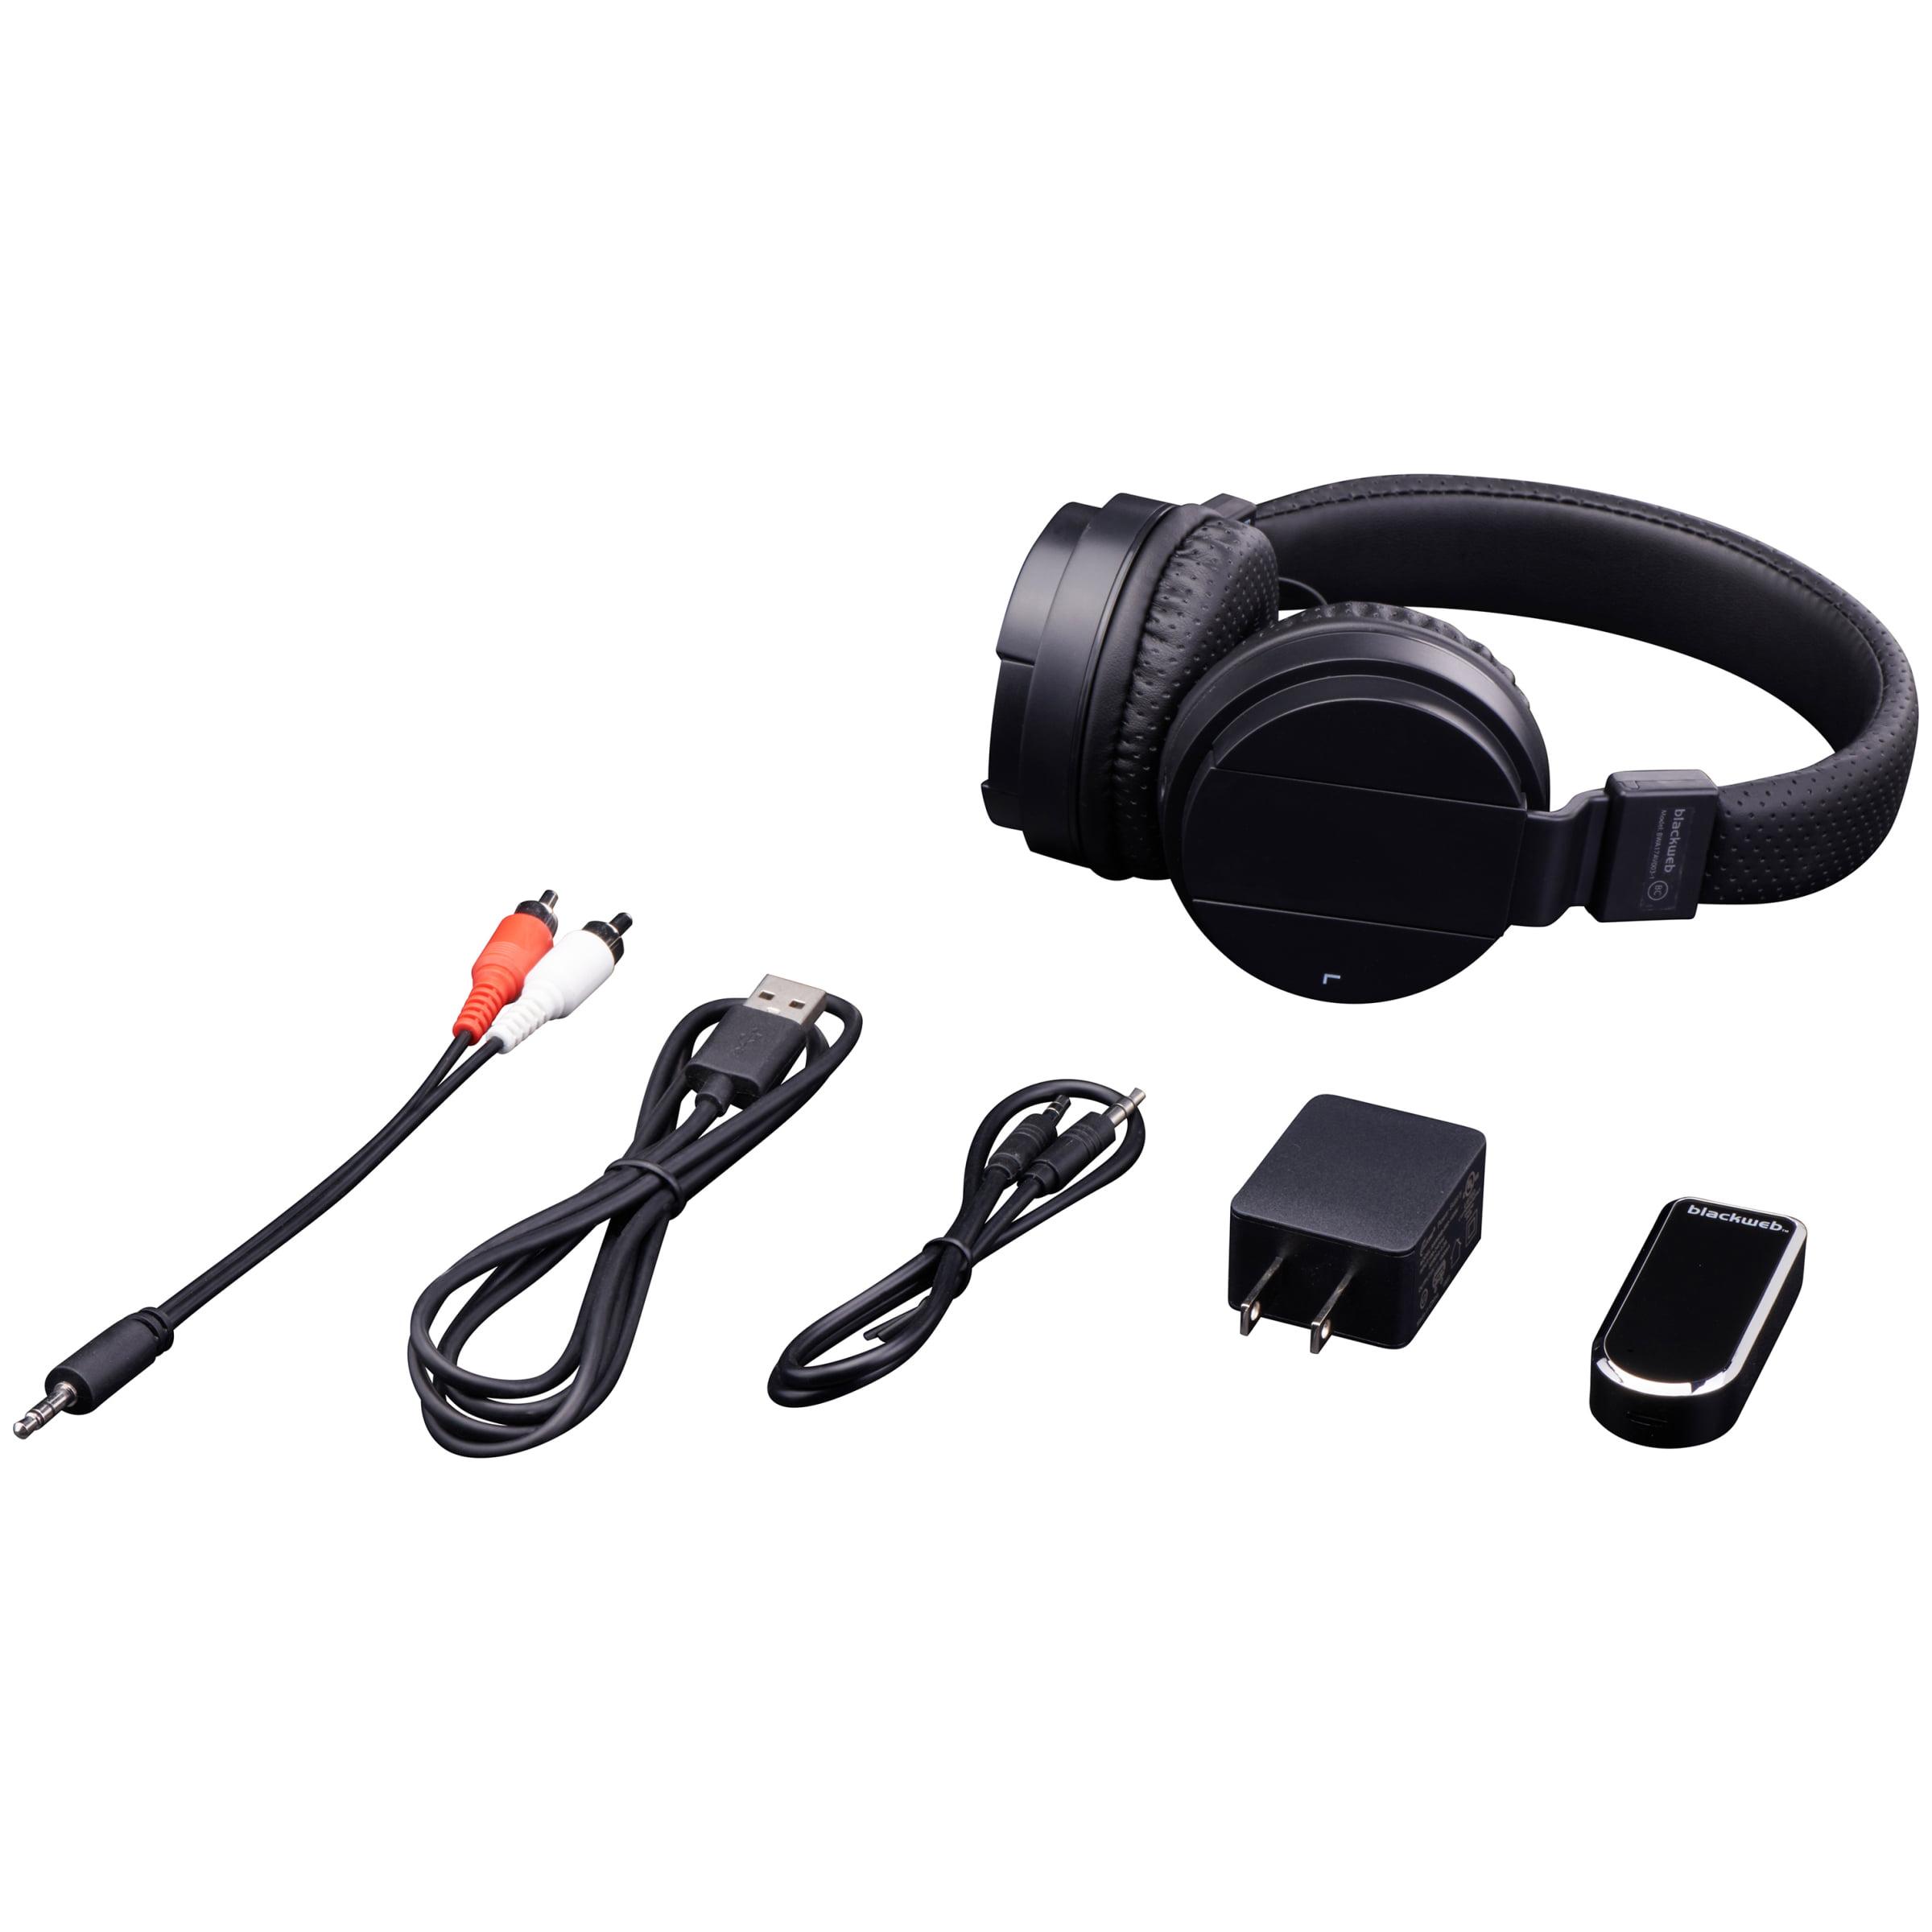 Blackweb Wireless On Ear Rechargeable Headphones With Bluetooth Audio Transmitter Black New Open Box Walmart Com Walmart Com